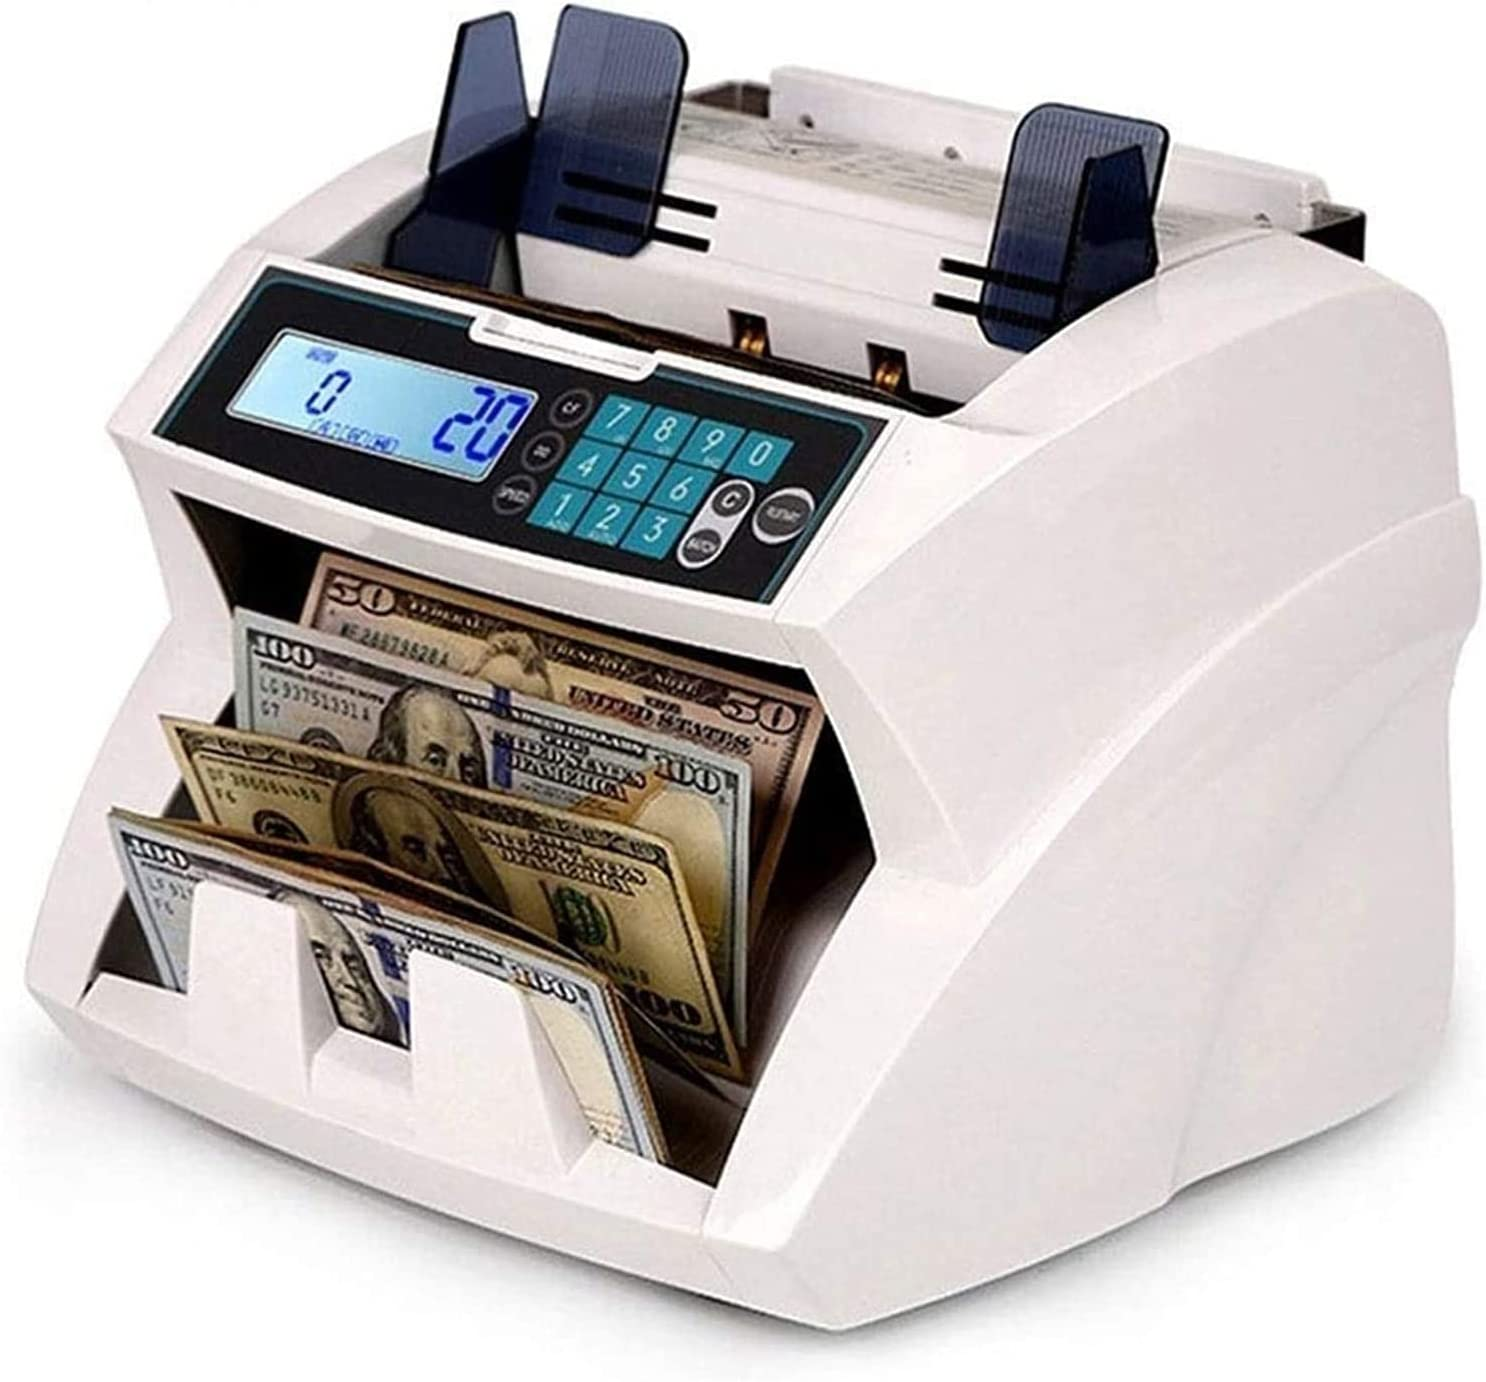 ZRSLGS Money Counter Machine Bill wi discount Mixed Over item handling Denomination